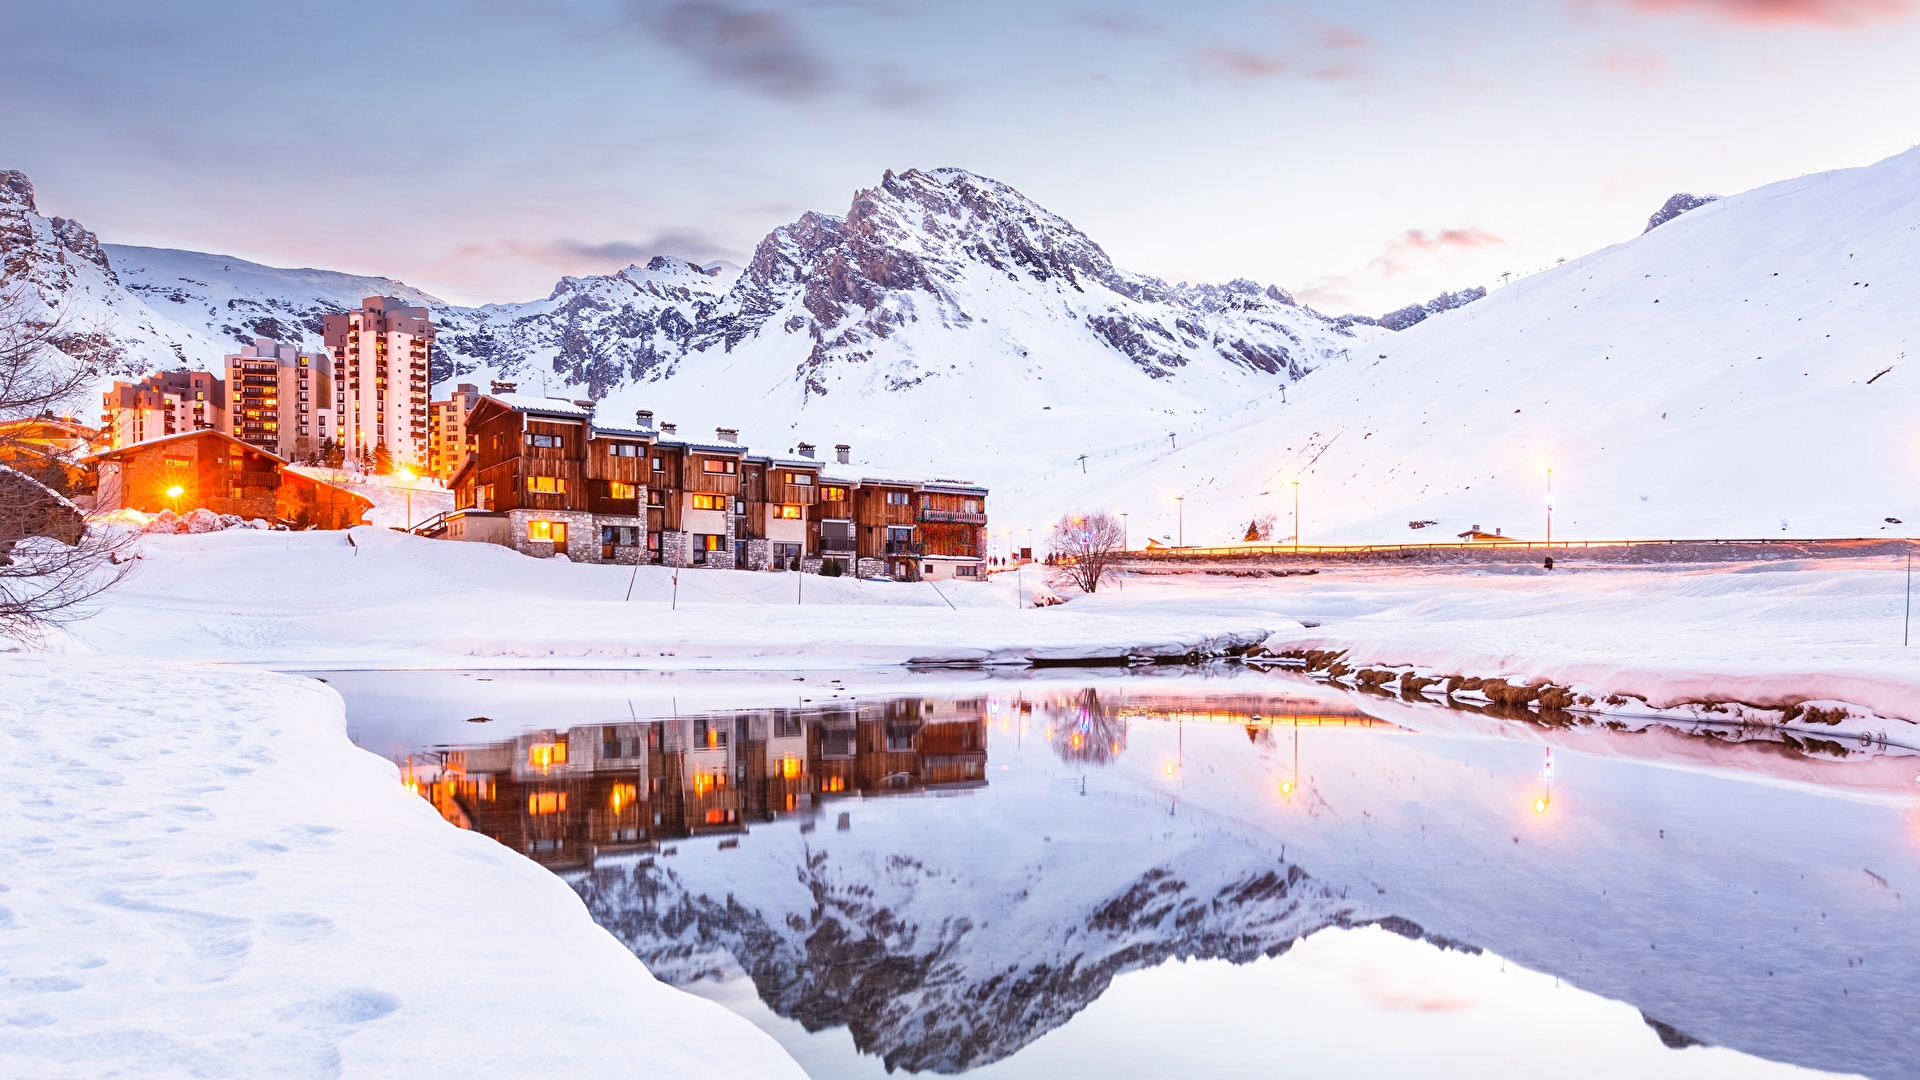 Photos Alps France Tignes Nature Winter Mountains Snow 1920x1080 1920x1080